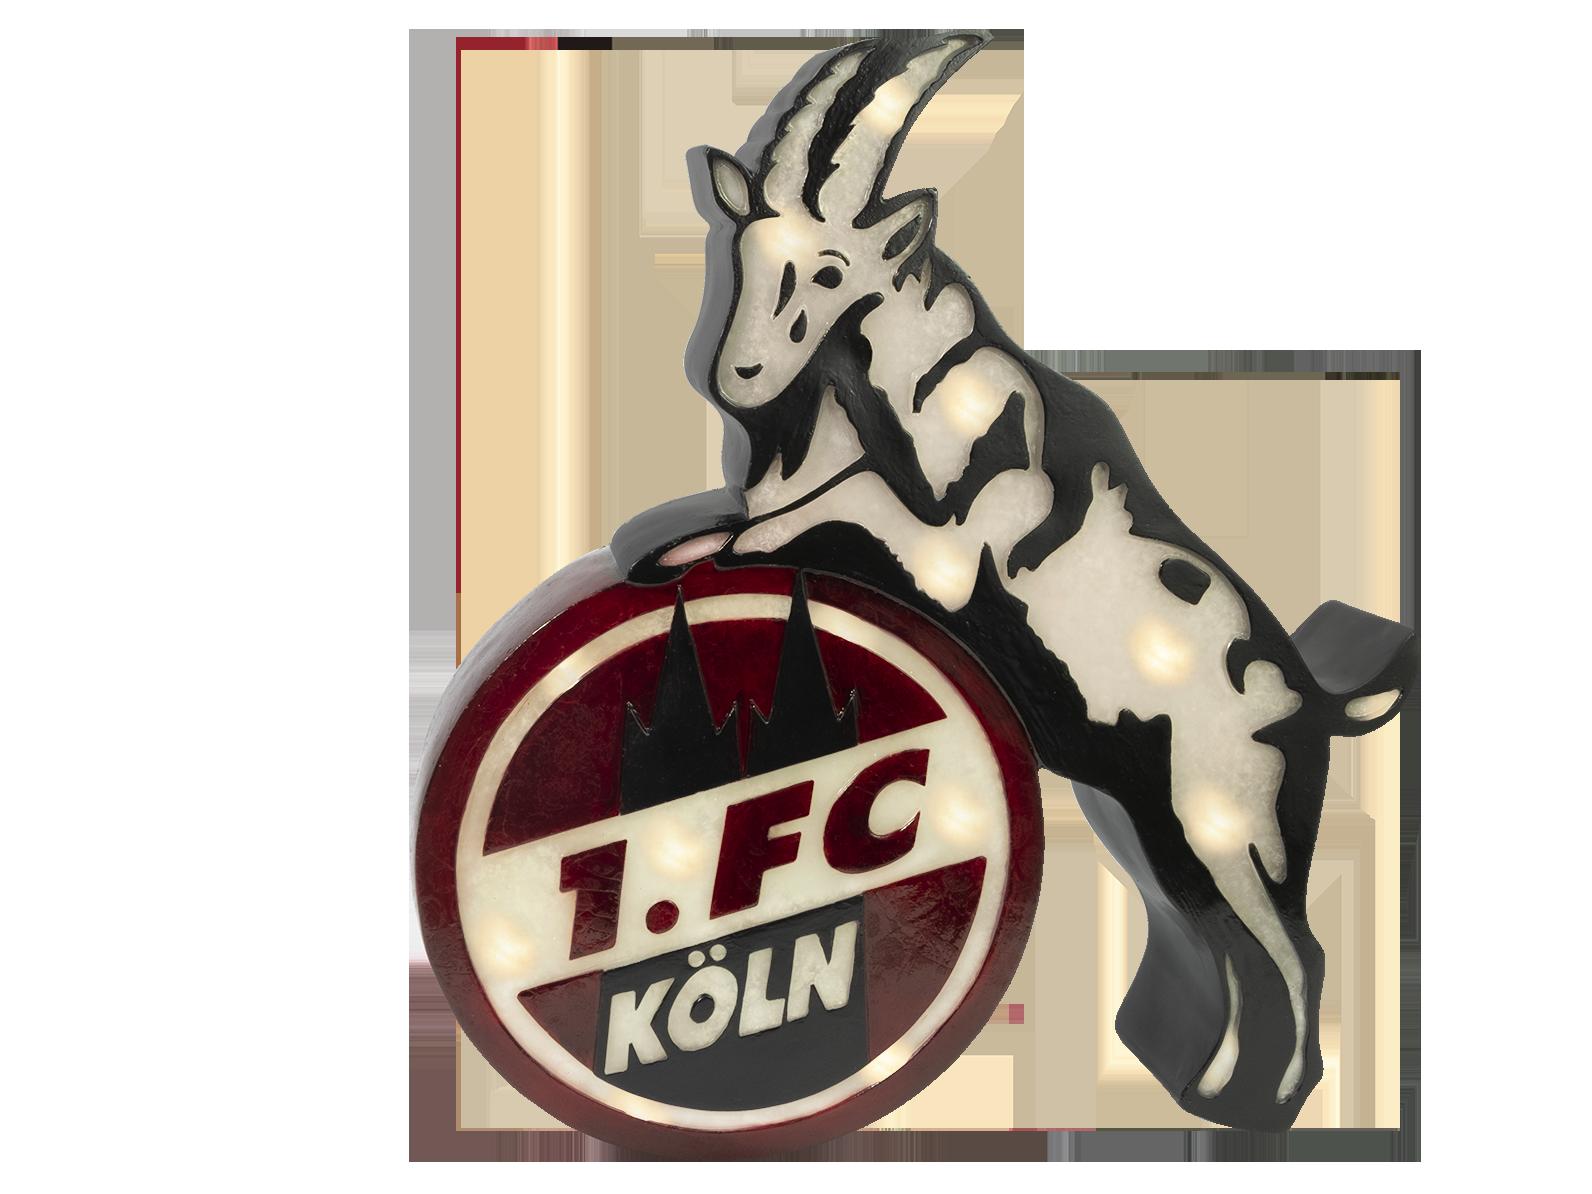 1. FC Köln Lampe Aufsteller